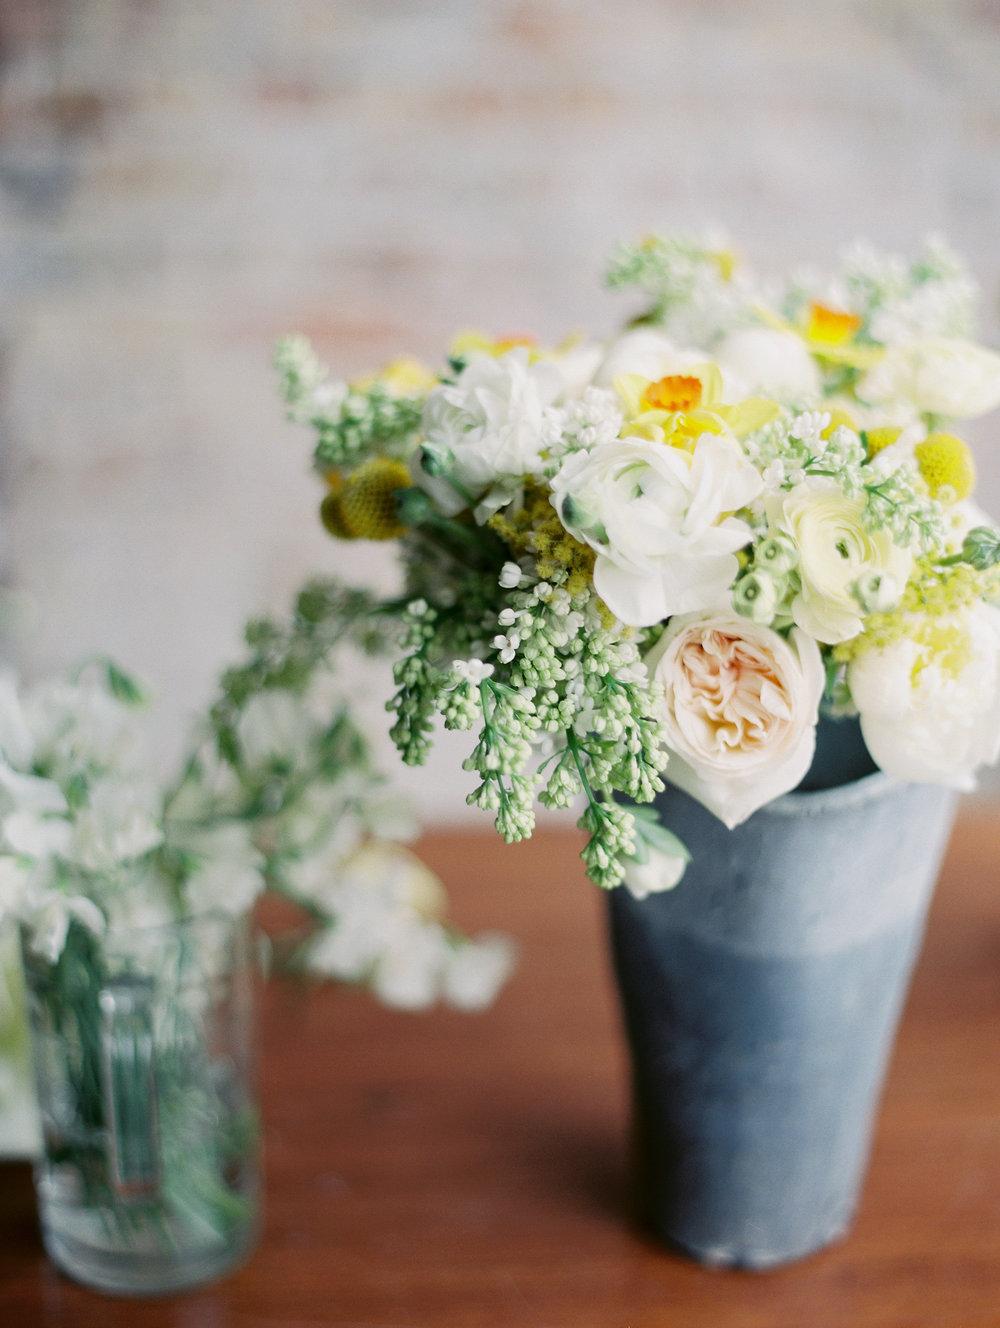 Flowers b Fleur, photo by Clary Pfeiffer Photo